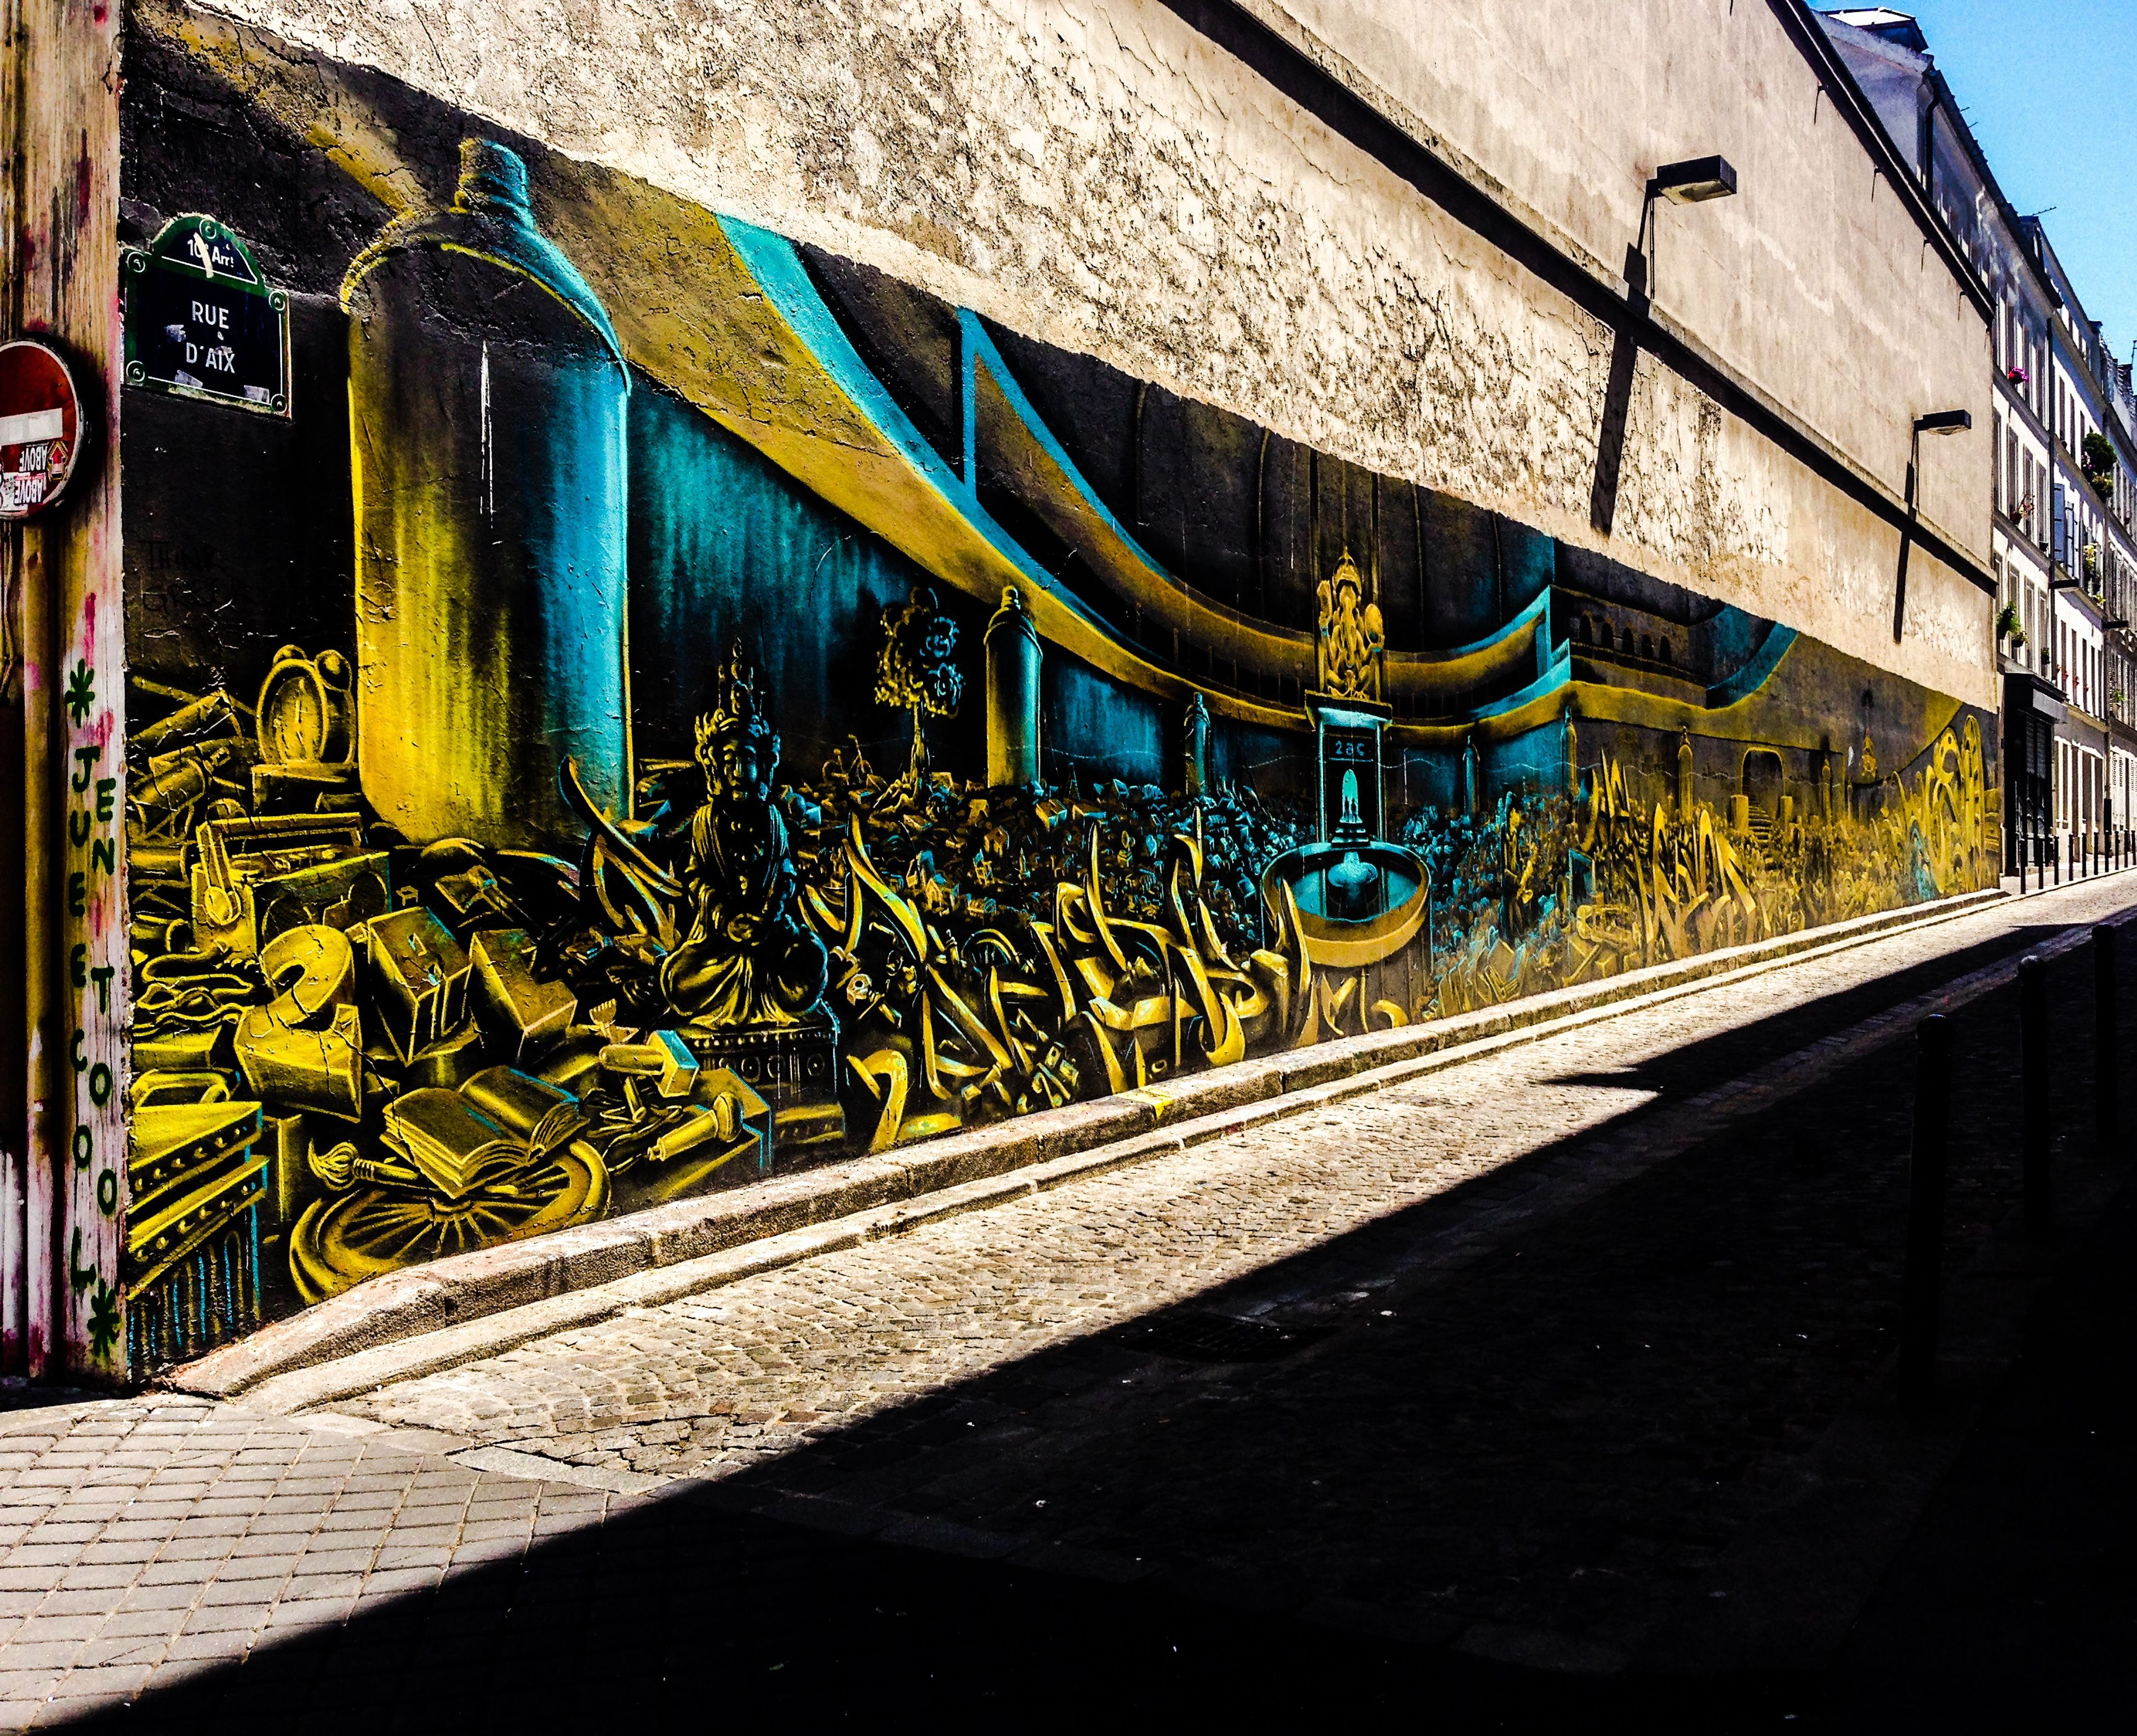 Paris Streetart Graffiti Streetart/graffiti Urban Art